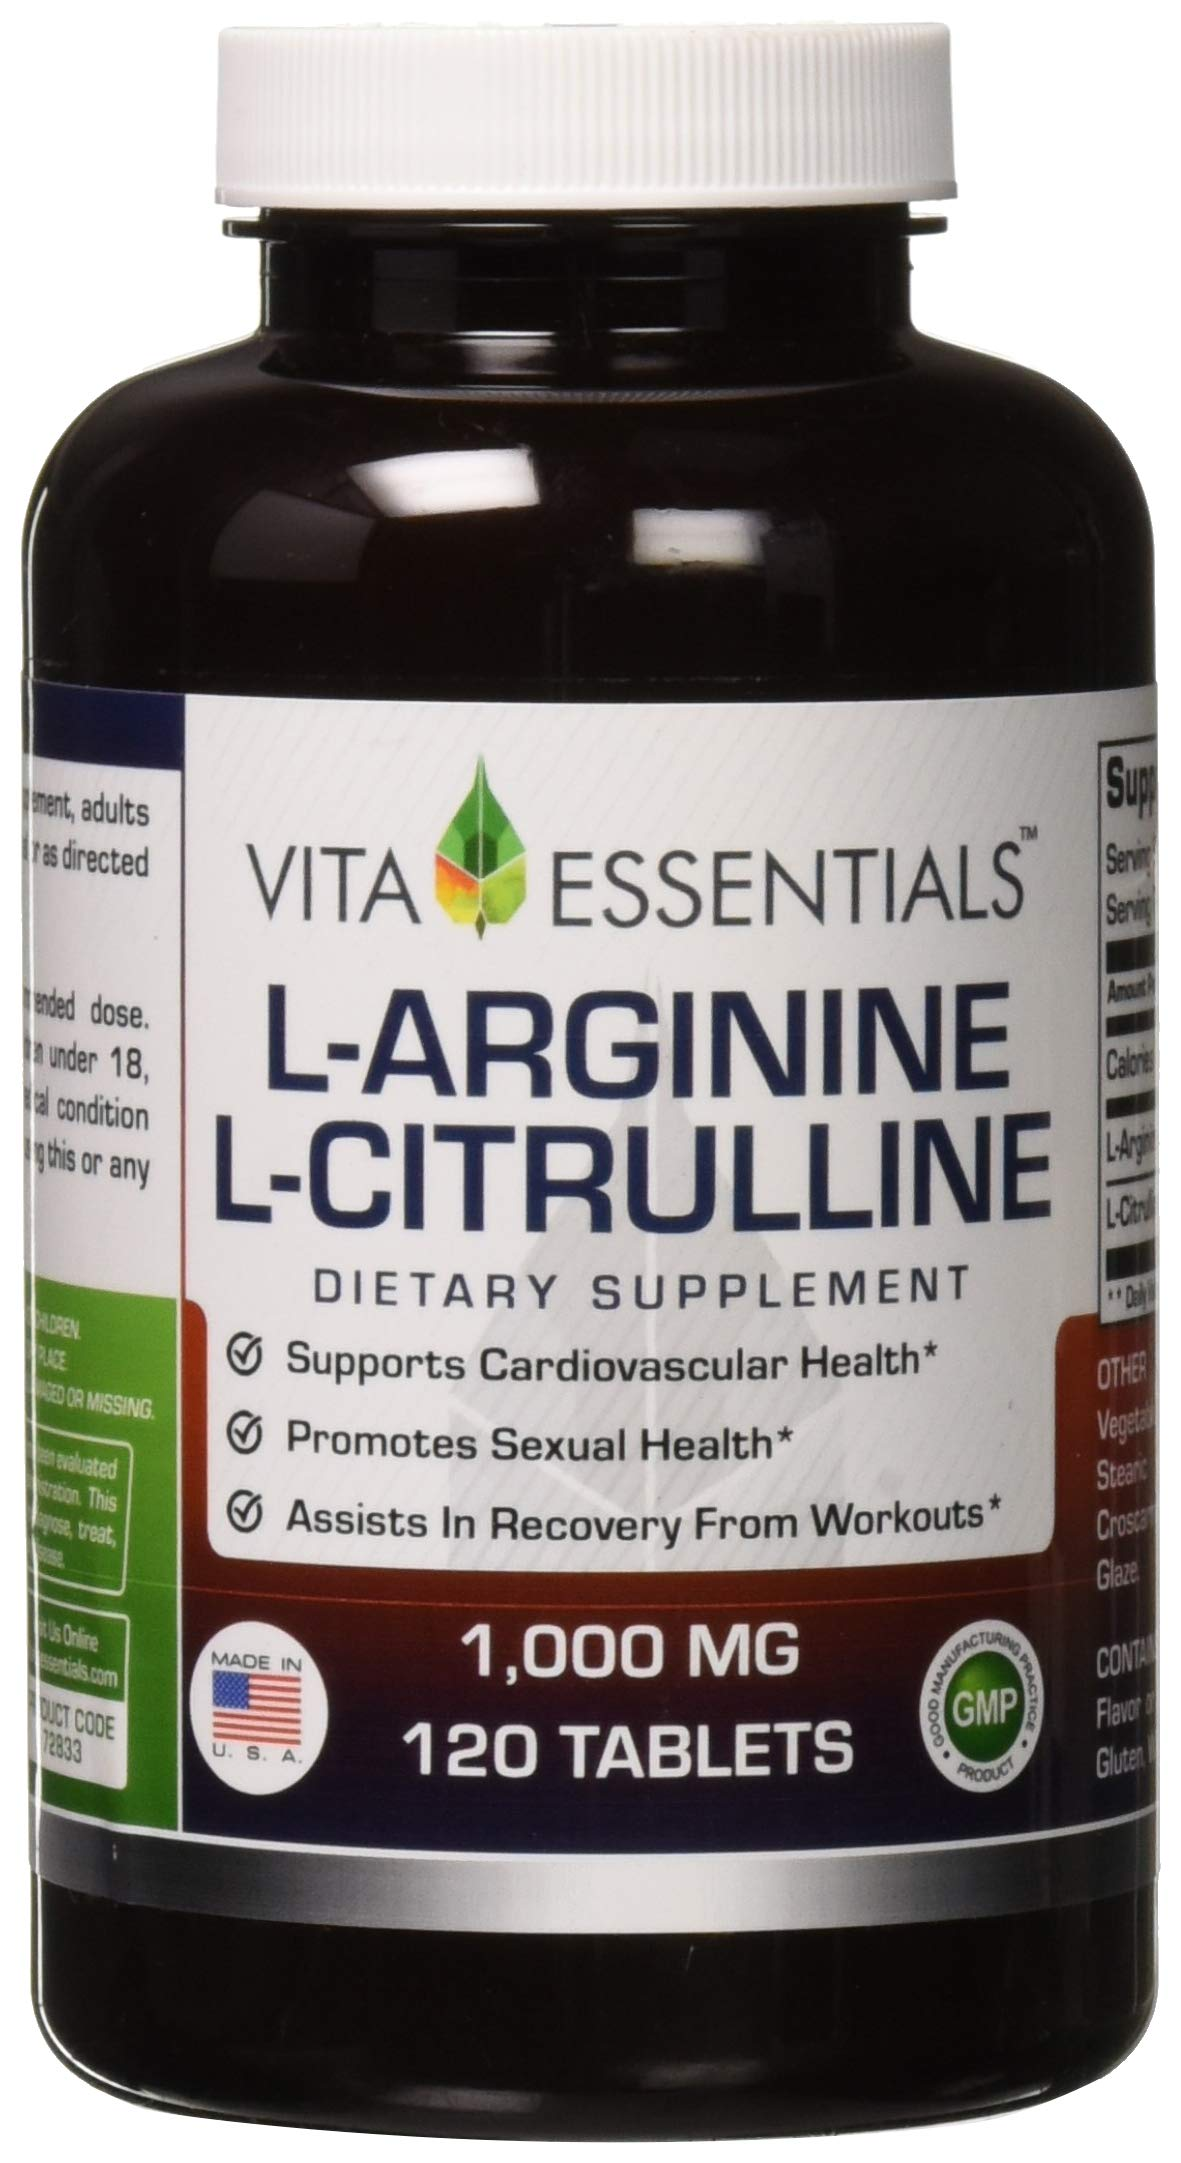 Vita Essentials Tablets, L-Arginine/l-Citruline, 1000 Mg, 120 Count by Vita Essentials